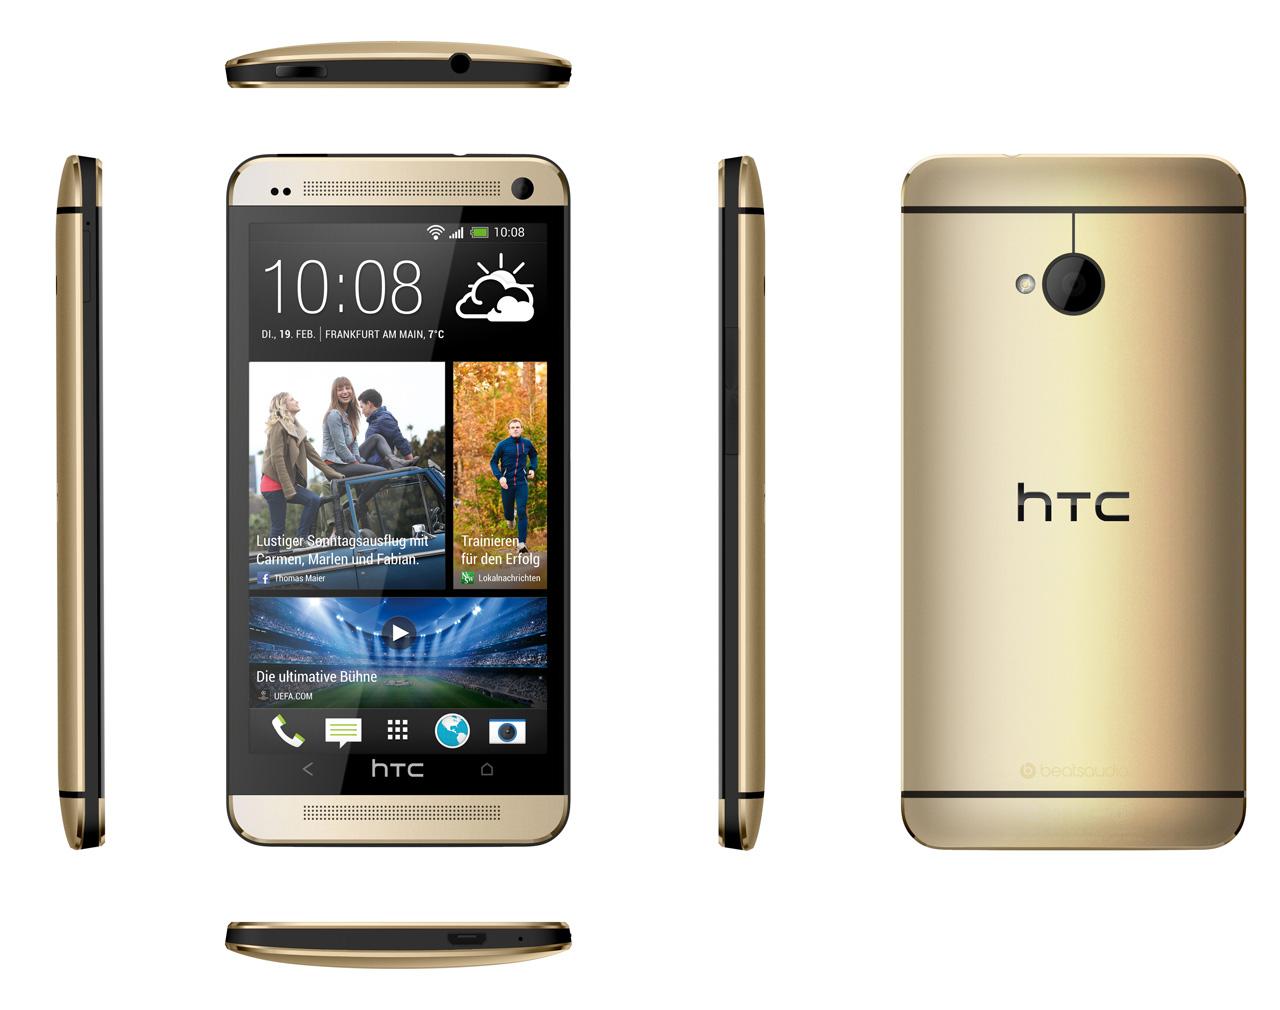 HTC One M7 สีทอง - Omega Gadget 2